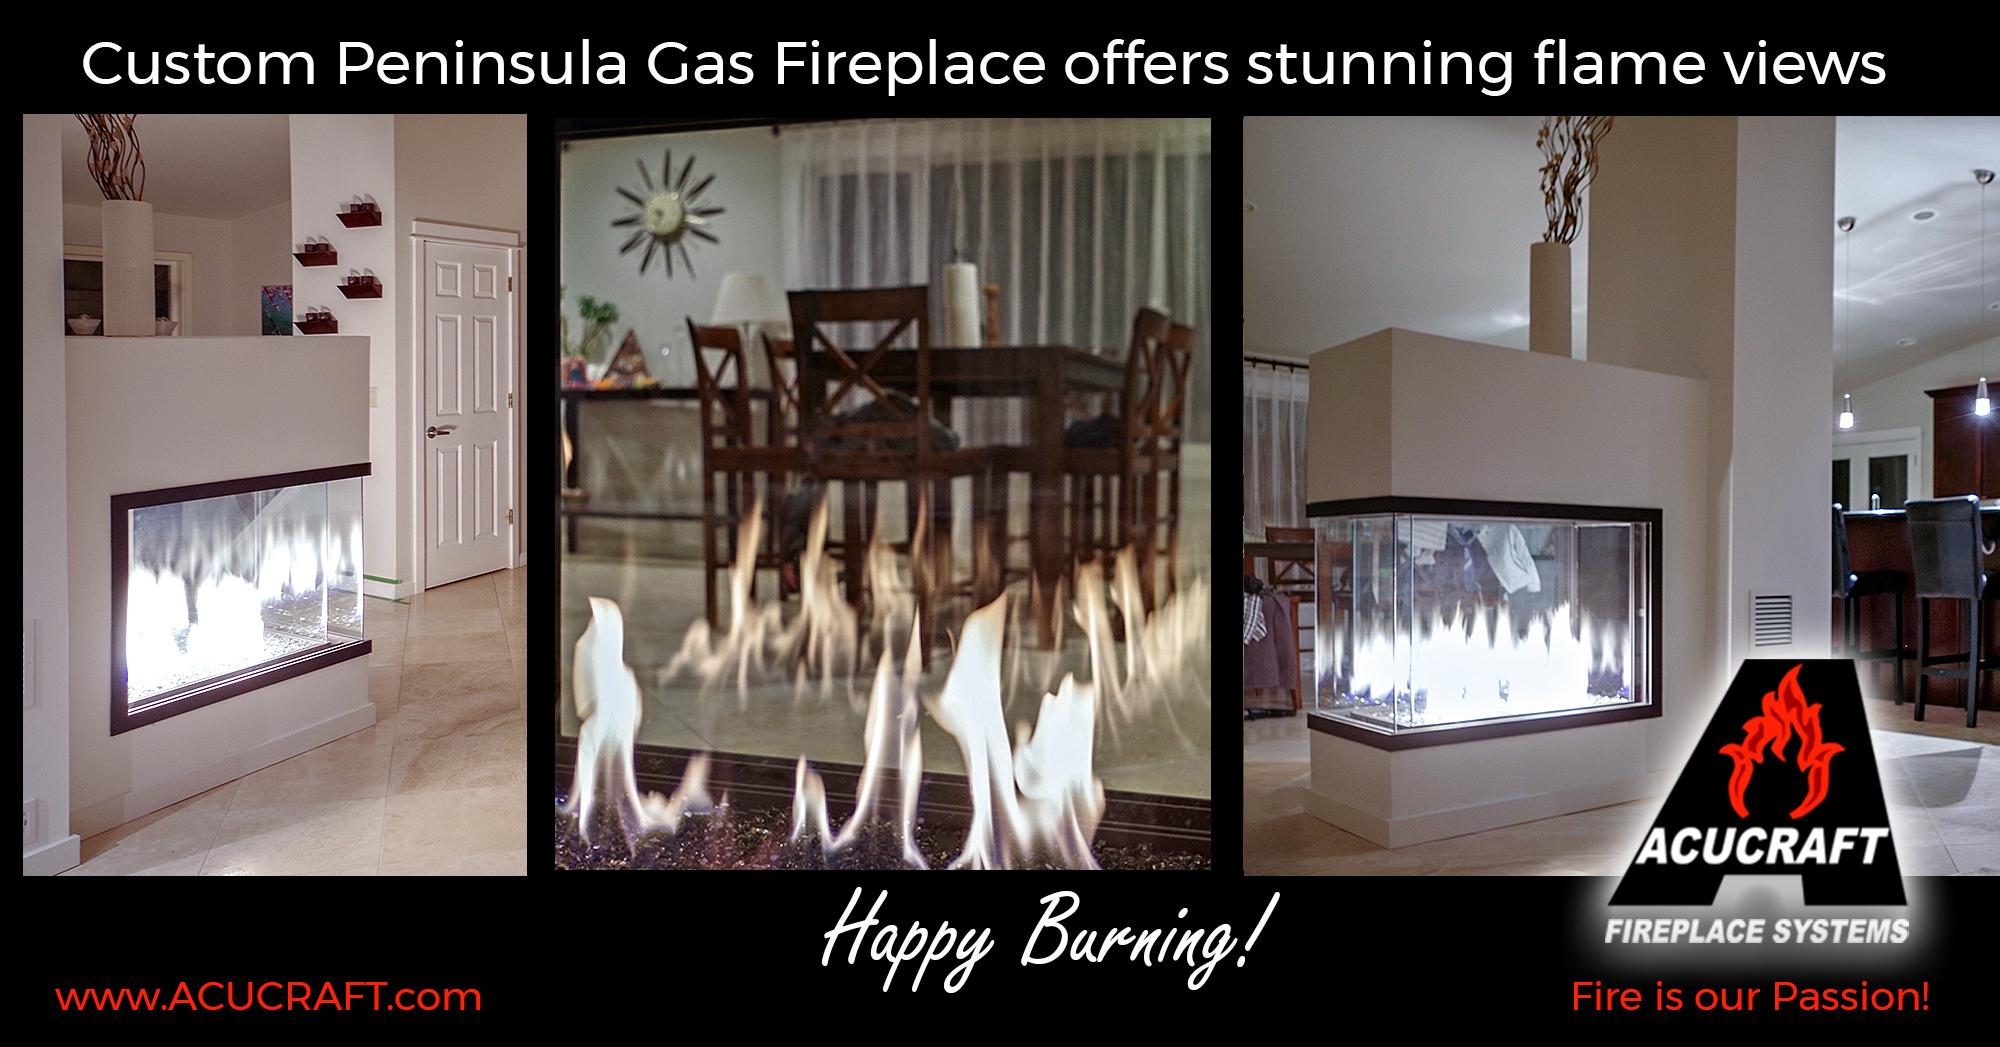 Acucraft Fireplace Beautiful Idea to Done Acucraft Custom Peninsula Gas Fireplace